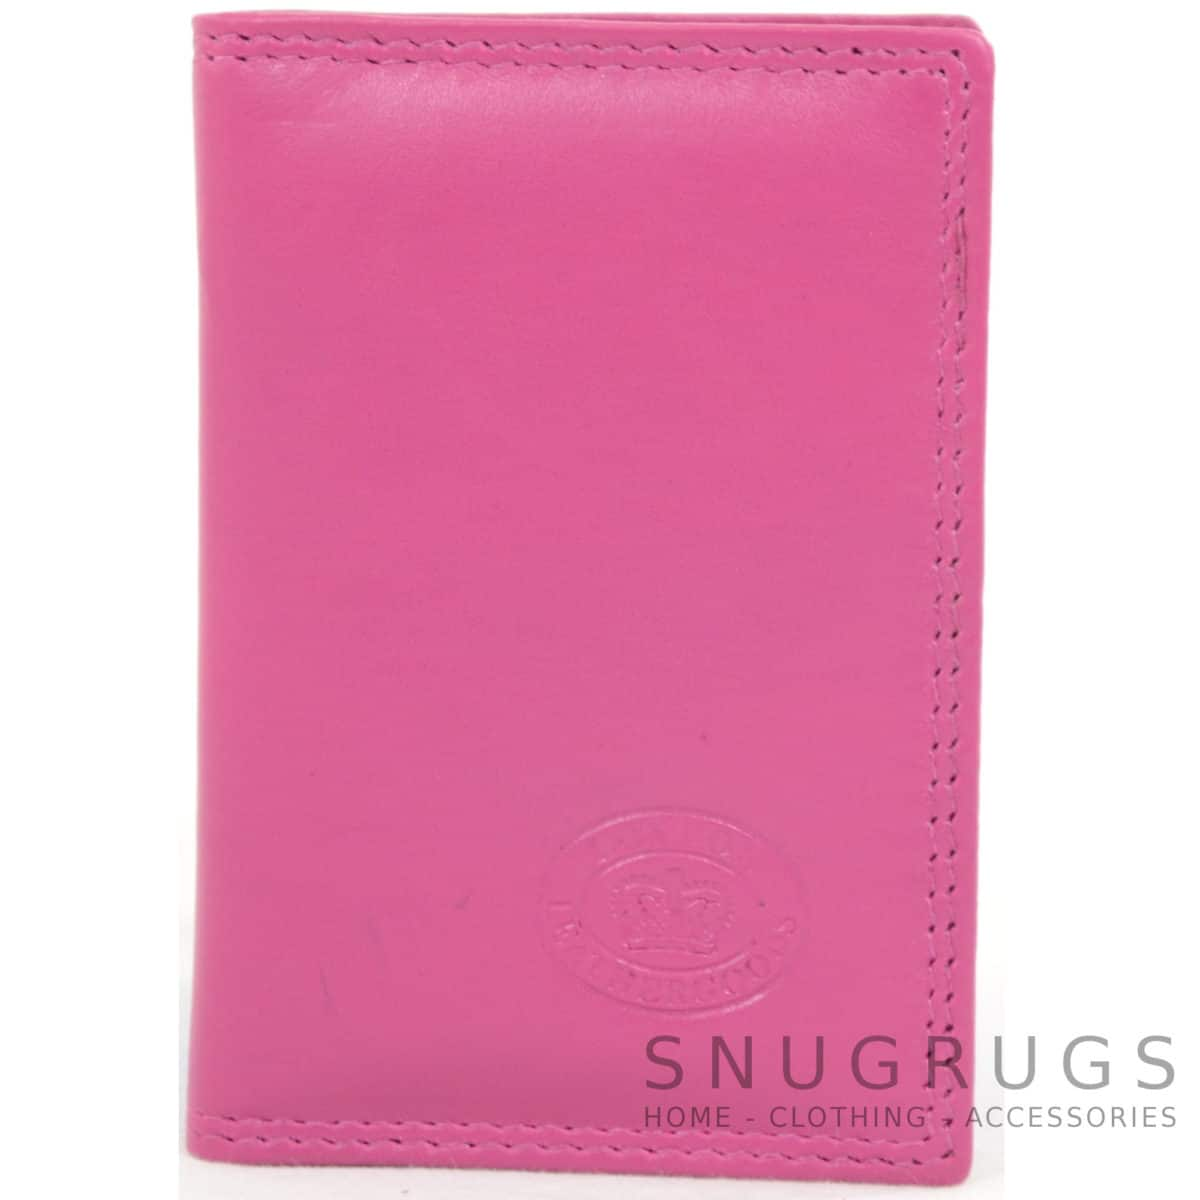 Soft Leather Credit Card / Travel Card Holder - Cerise Pink